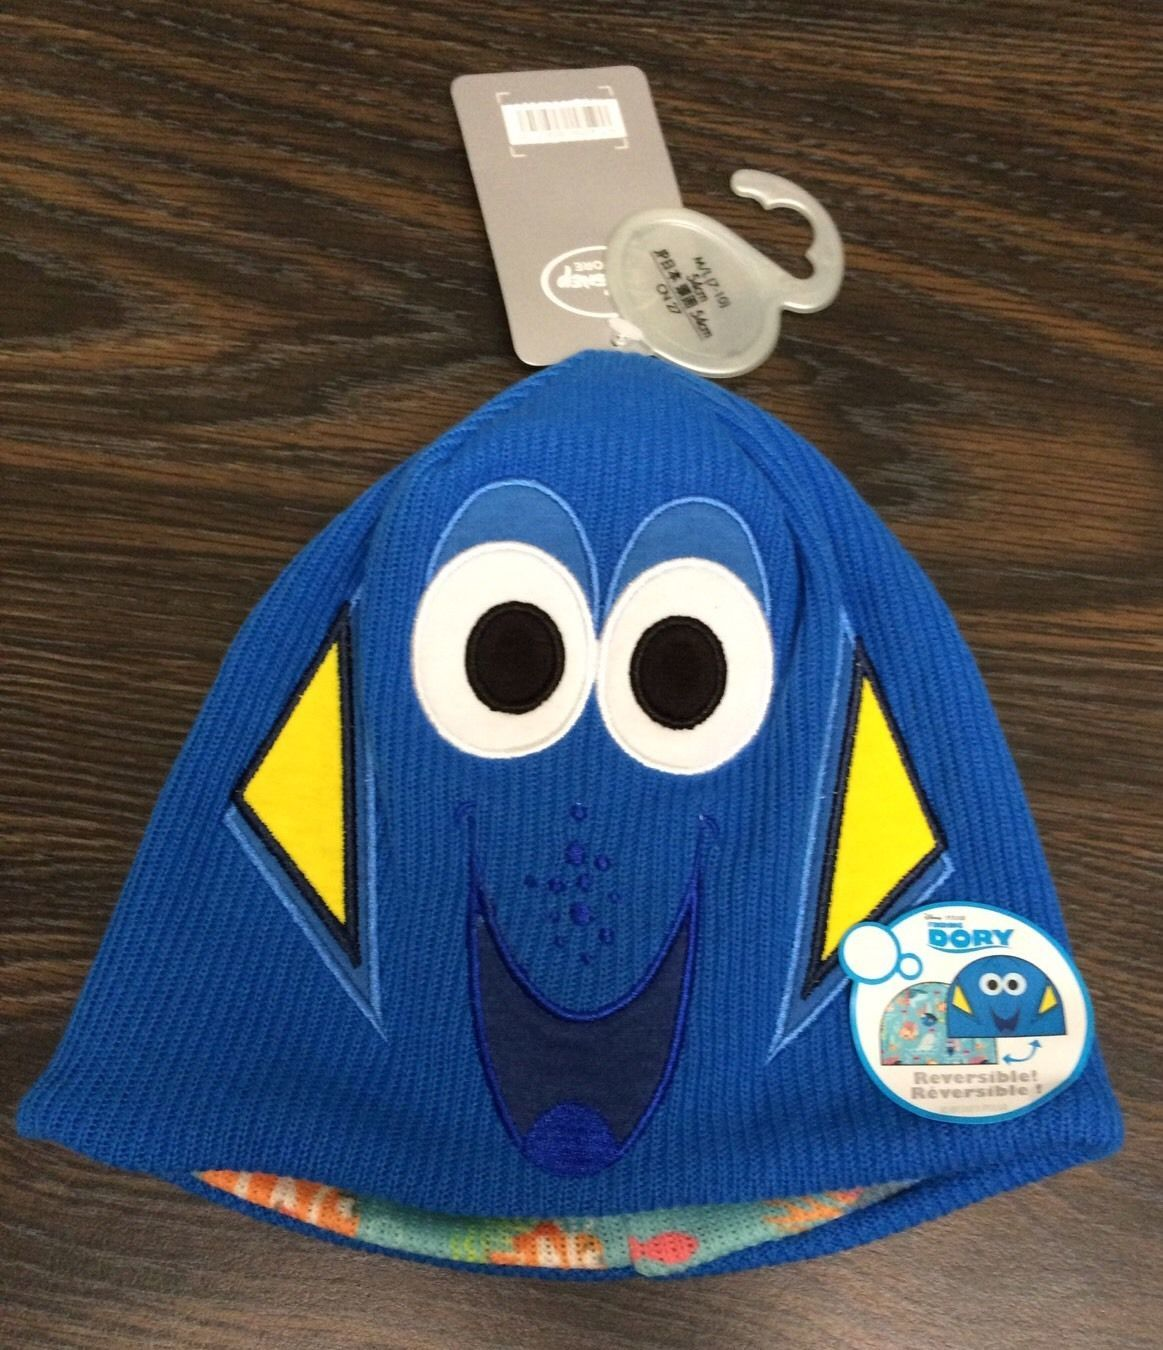 Disney Store Finding Dory Reversible Kids Hat PIXAR Unisex sz M L 7 - 10